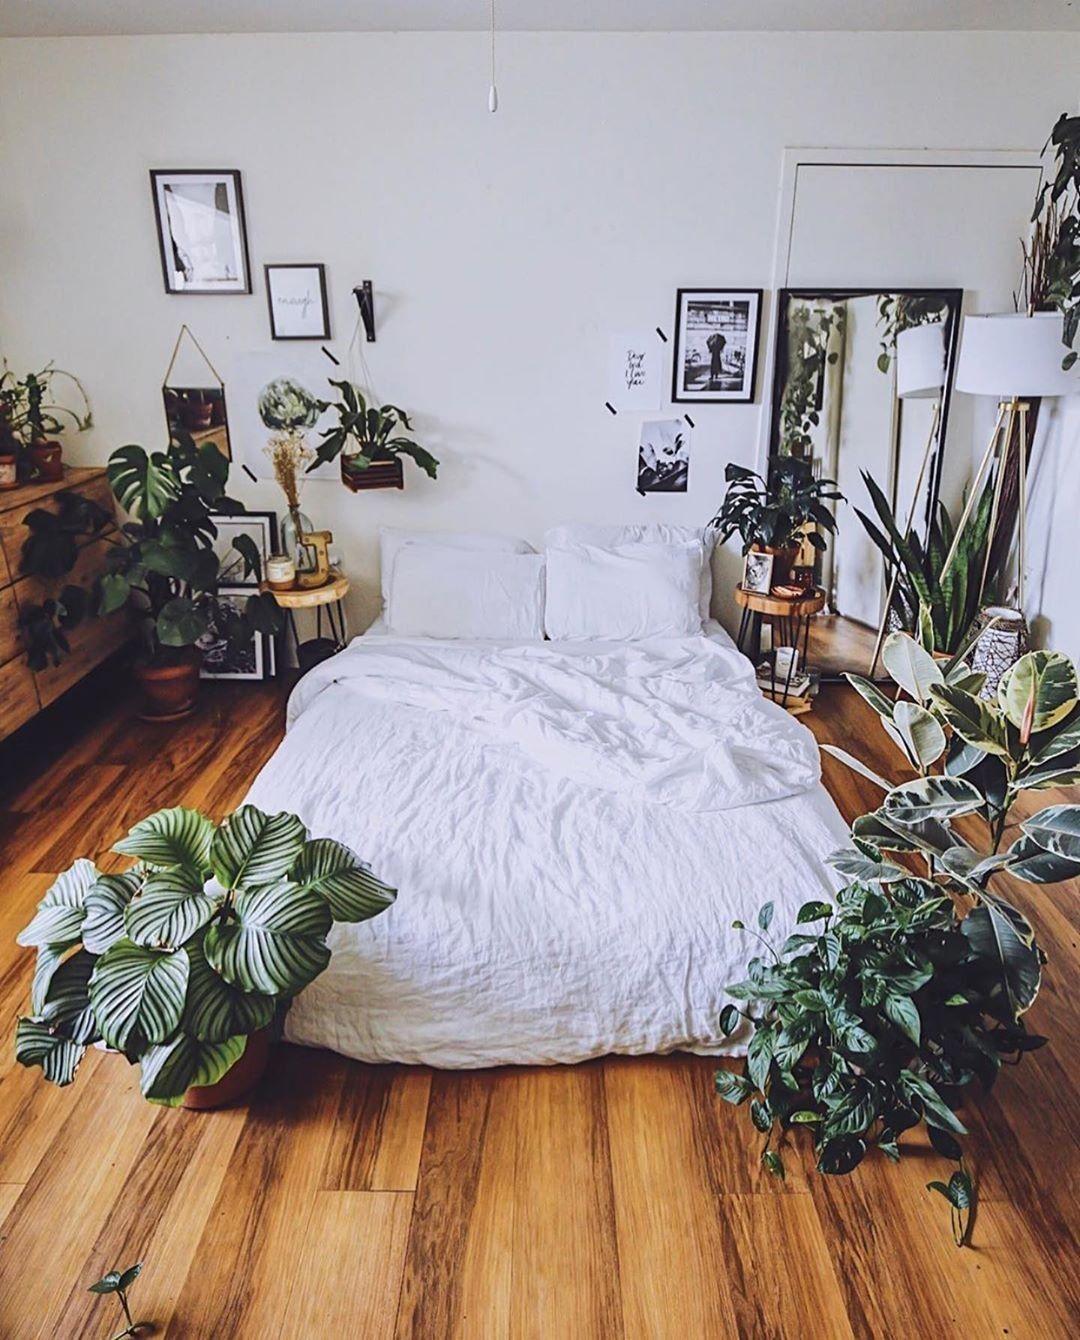 Modern Bohemian Bedroom Decor Ideas Bedroom Design Modern Bohemian Bedroom Bedroom Decor